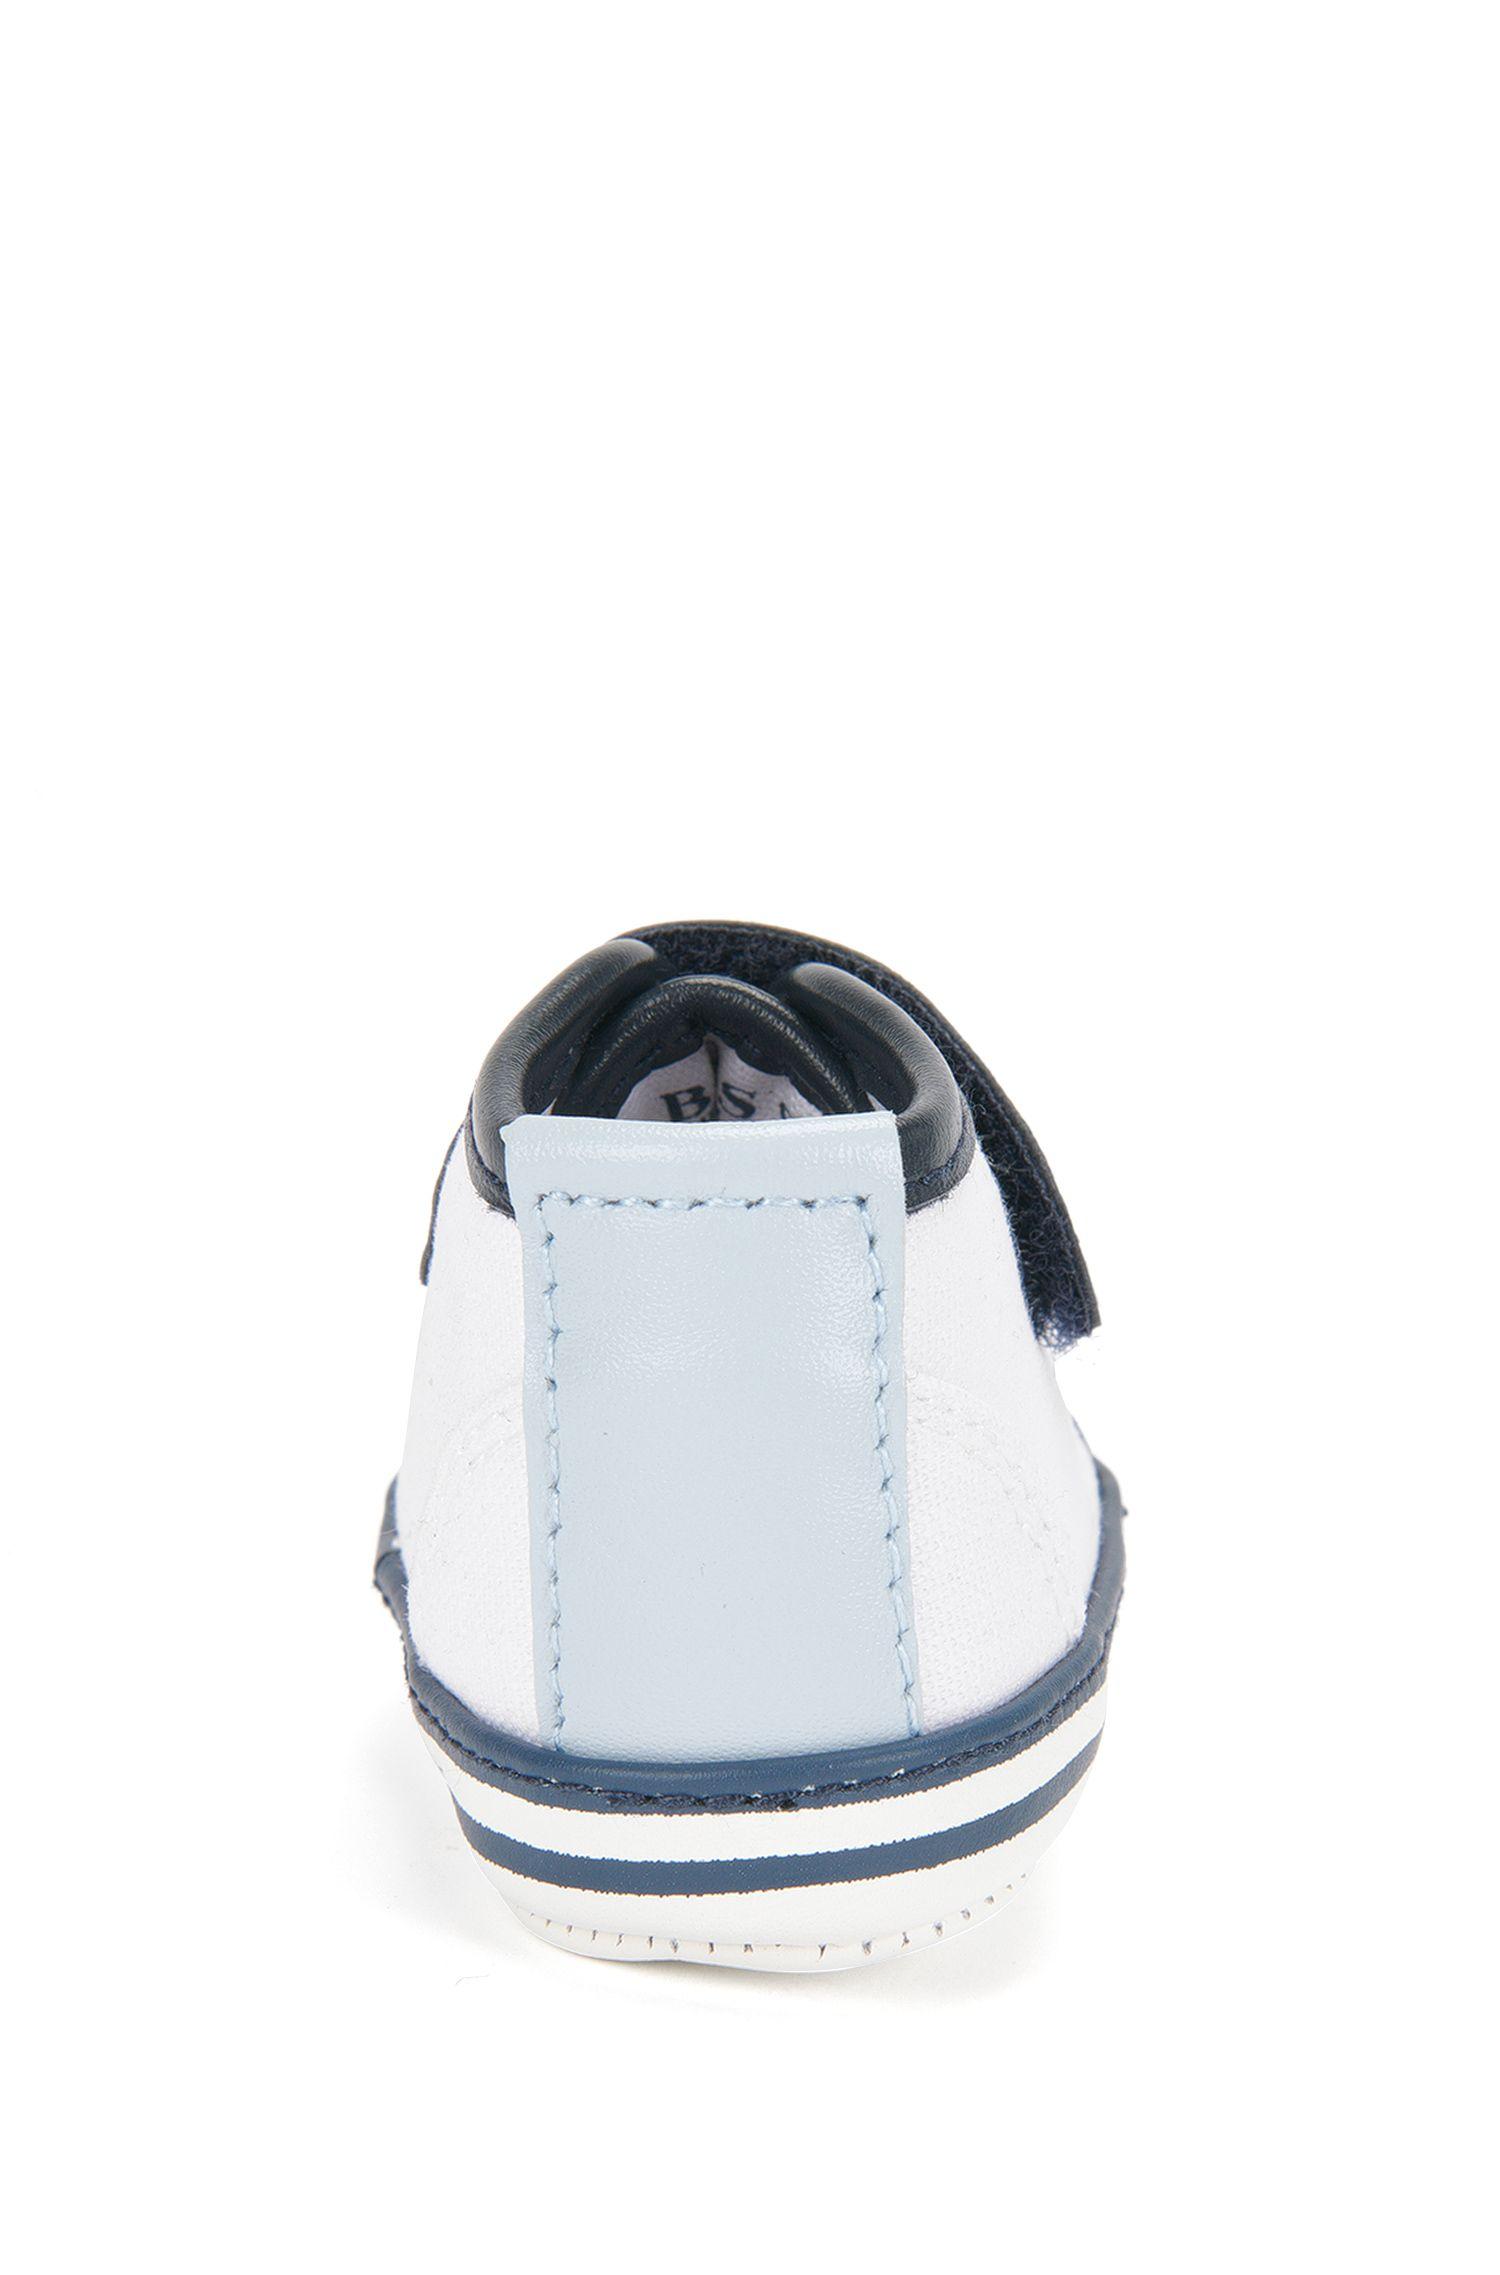 Baby-Schuhe mit Ledersohle: 'J99043'